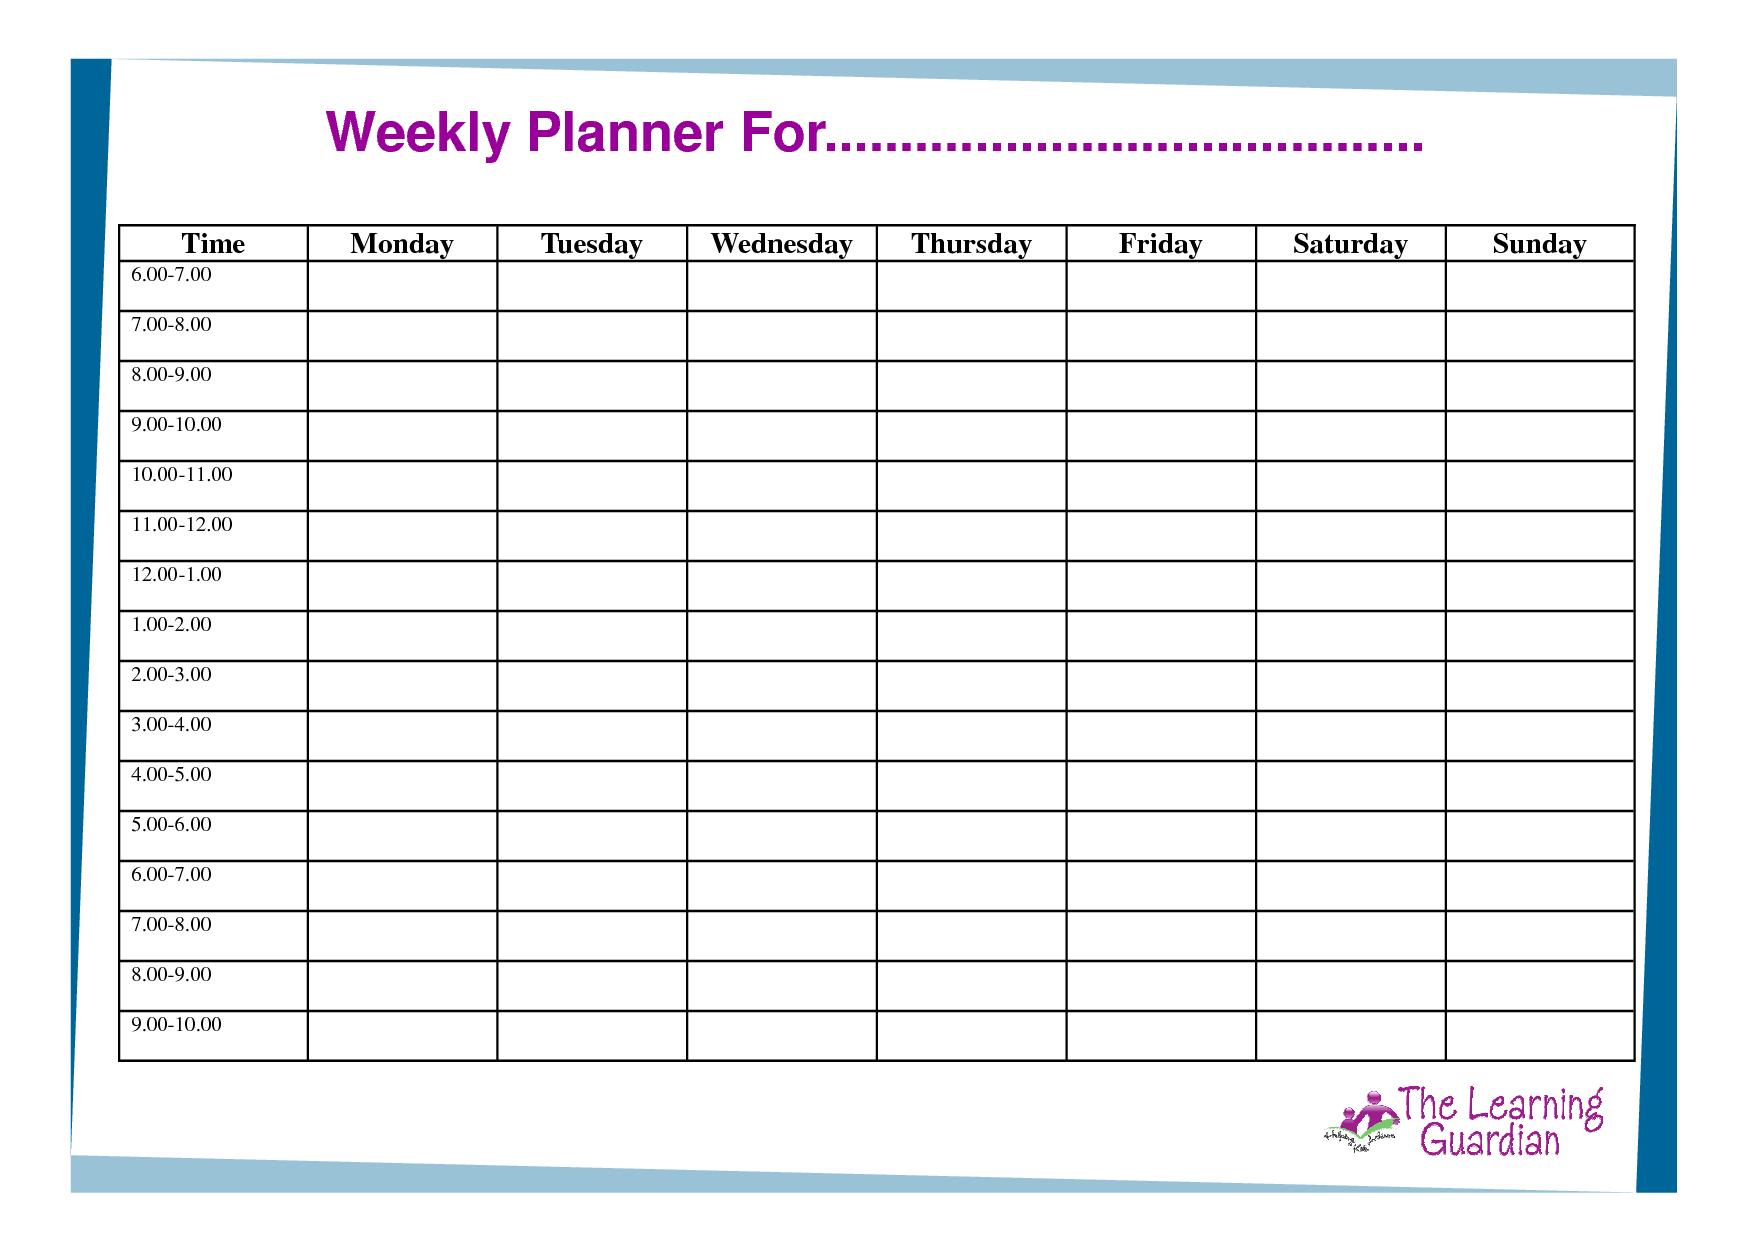 Free Printable Weekly Calendar Templates | Weekly Planner For Time in Editable Weekly Calendar Template